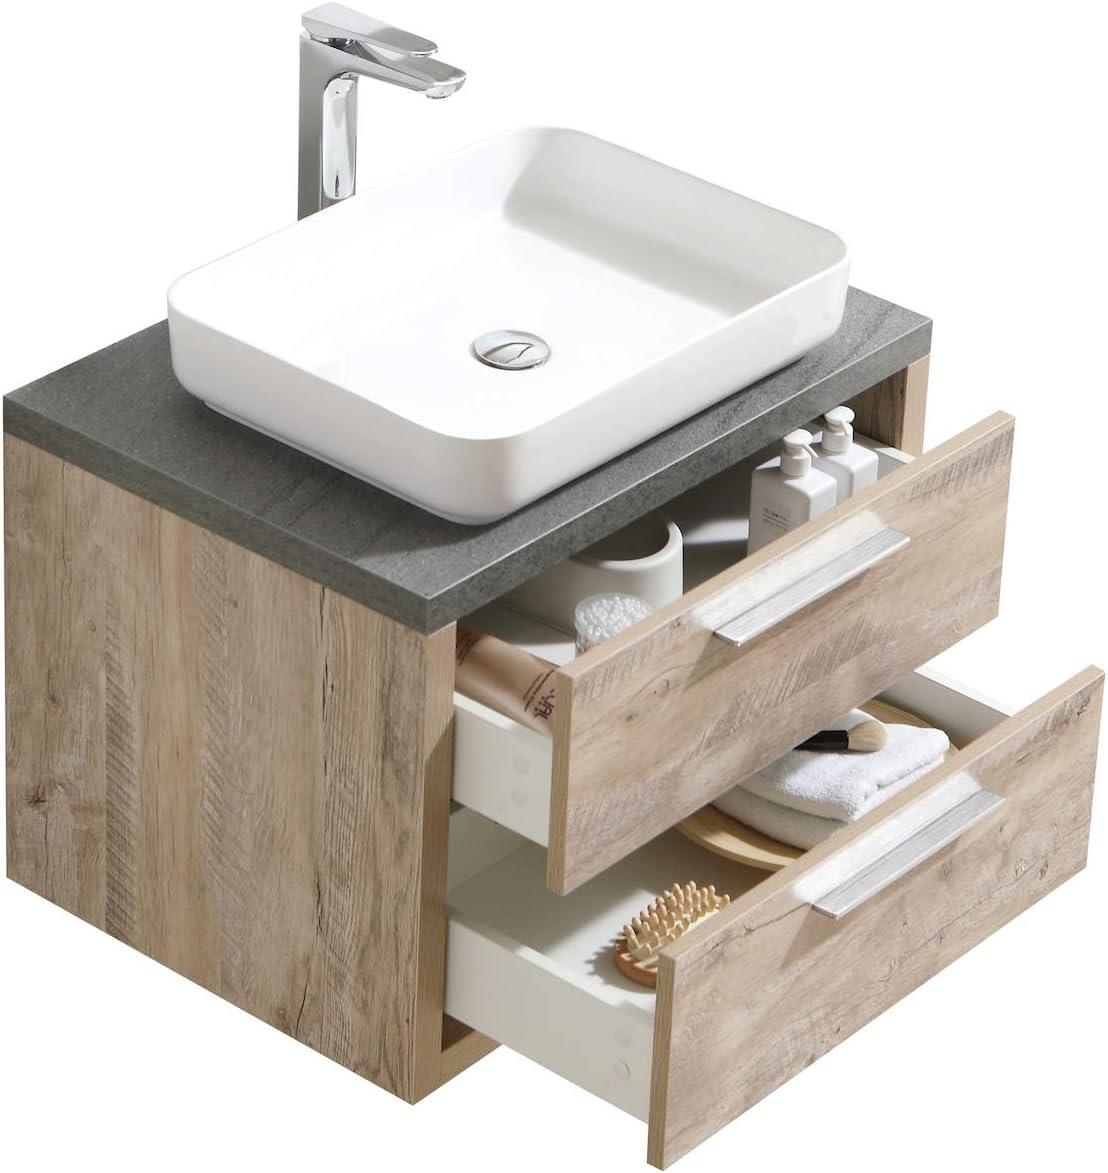 Bathroom Bath Furniture Indiana 70 cm Nature Wood-Under Cabinet Sink Mirror